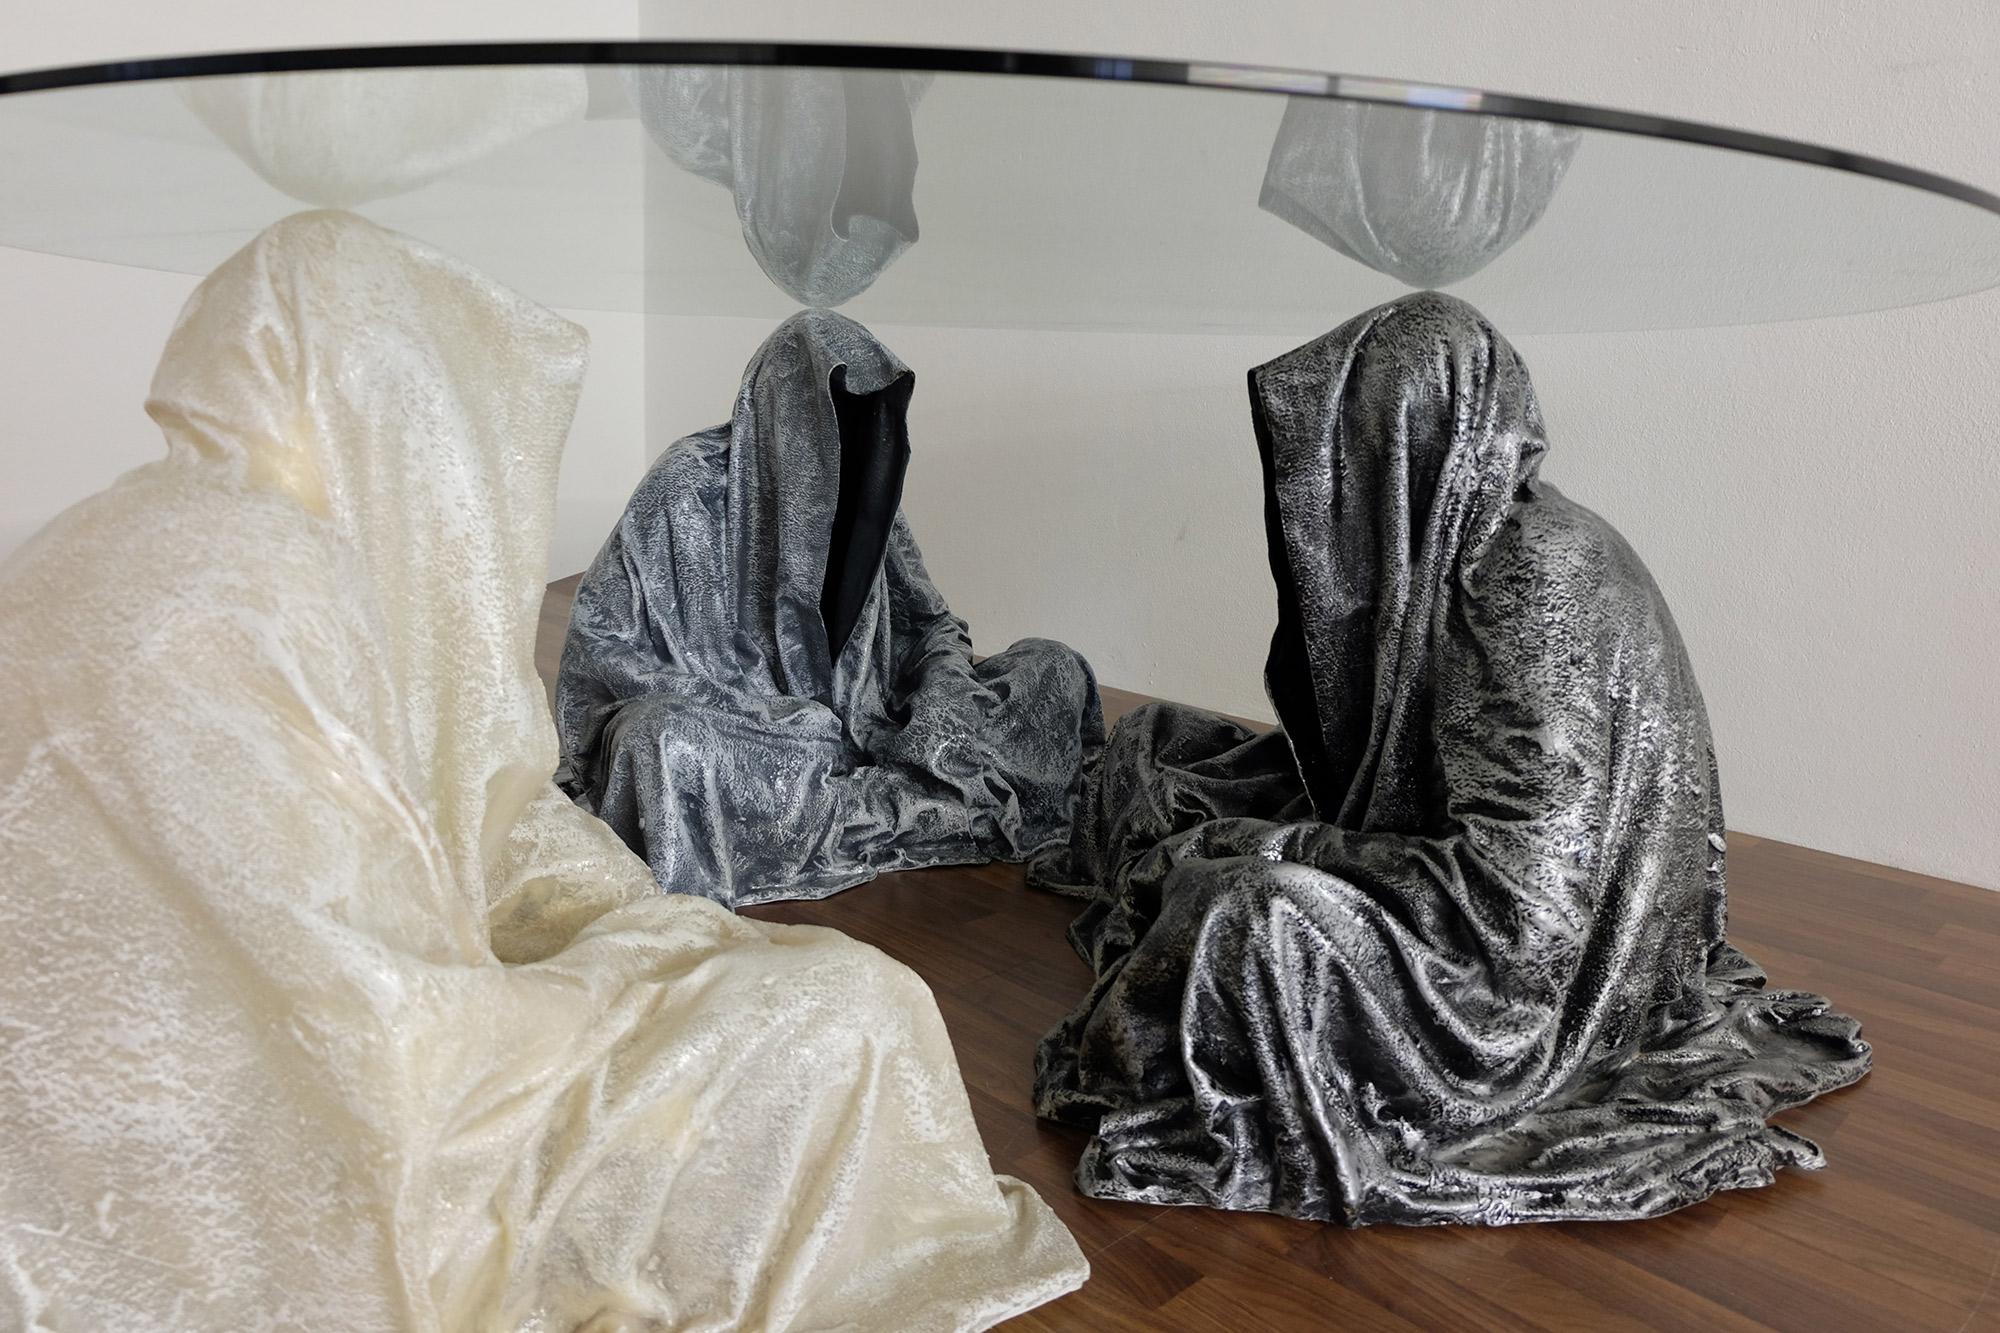 exclusive-furniture-guardian-table-glass-sculpture-statue-contemporary-light-art-design-antique-fine-art-manfred-kili-kielnhofer-4314